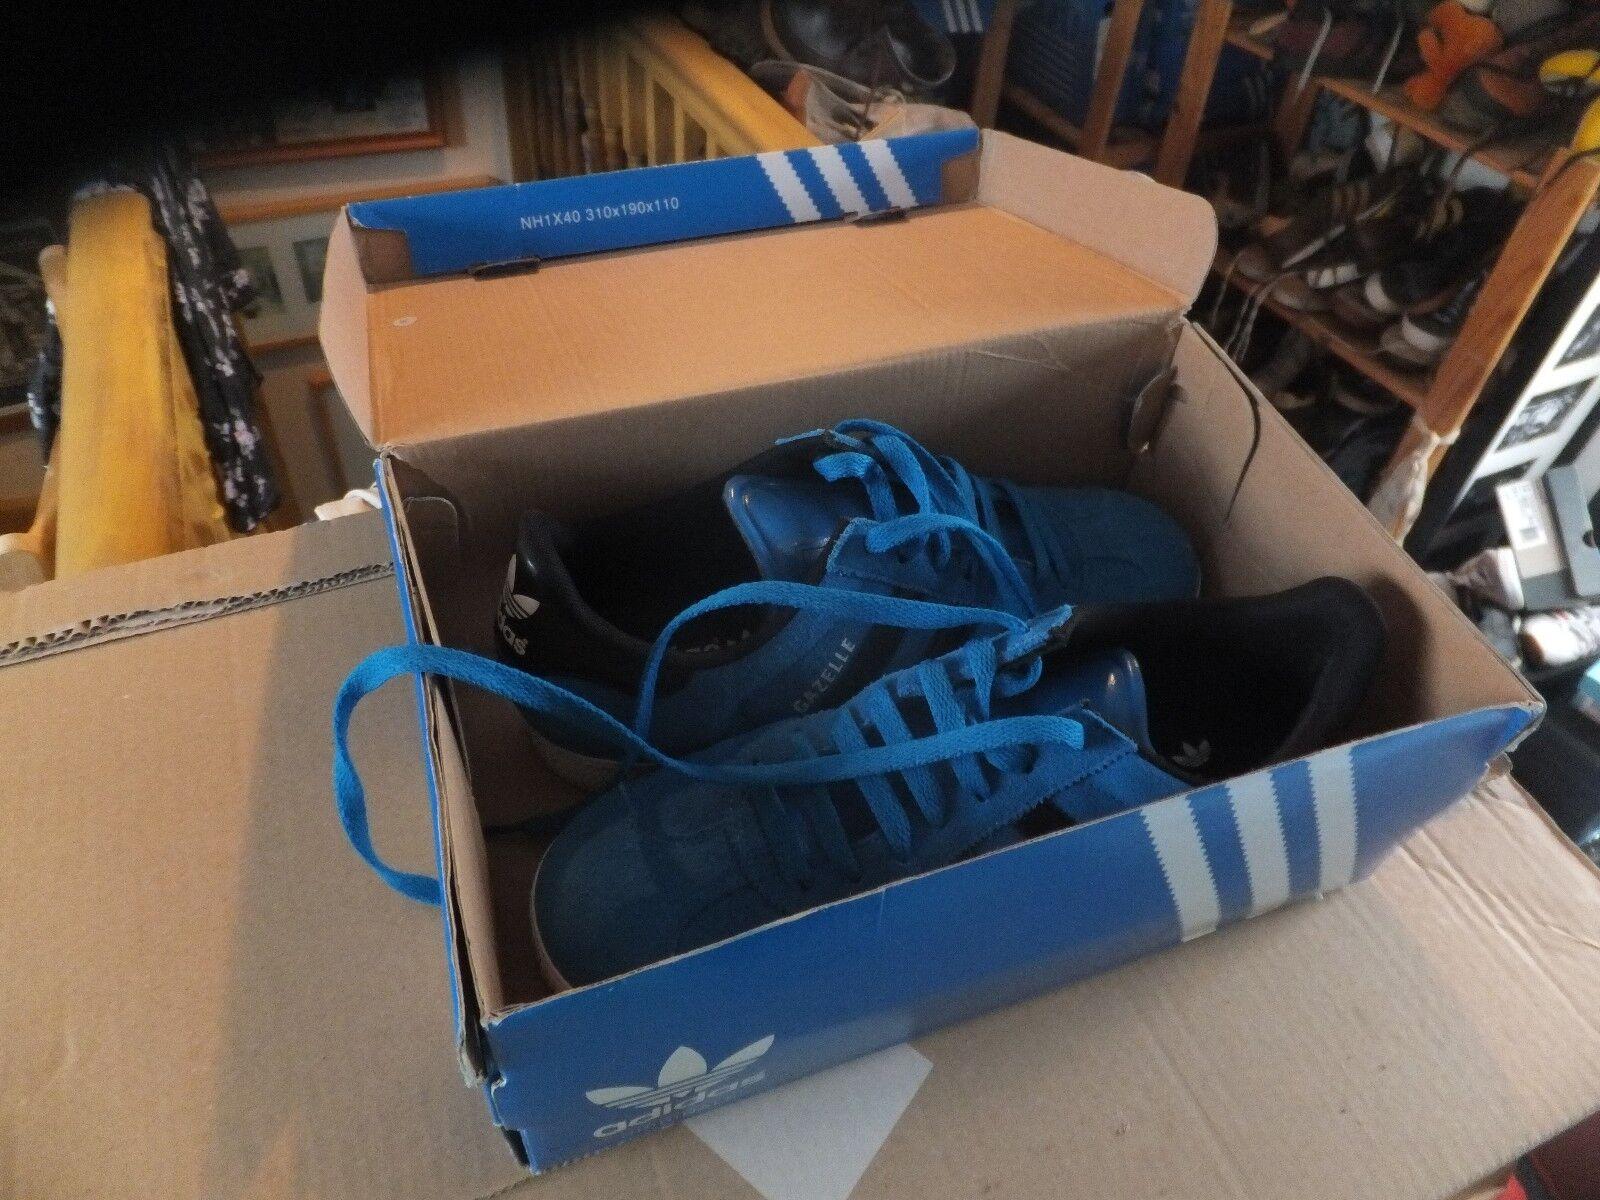 ADIDAS Gazelle Stock bluetrainers da uomo 8.5UK Dead Stock Gazelle Vintage 361654